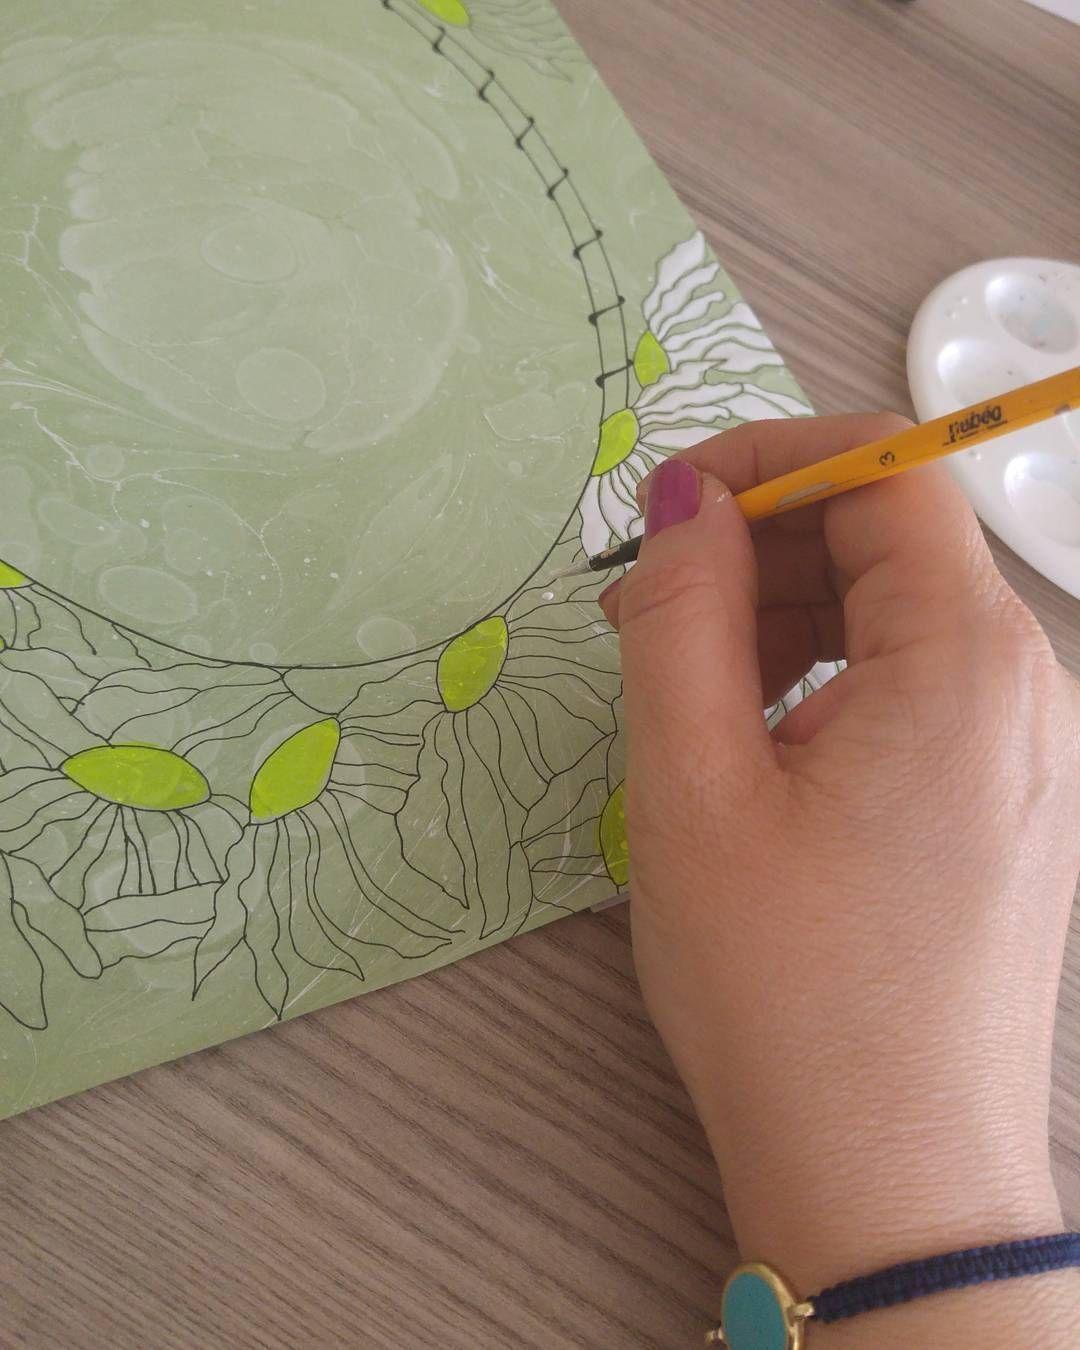 Hep gezmek olmaz, birazda çalışmak lazım��✏�� #wood#woodart#paint#colour#colourfull#handmade#handpaint#Idid#craft#home#homedecor#myhome#decor#paintlover#hoby#ahşap#woodpaint#ahşapboyama#renk#rengarenk#fikir#benyaptım#çizim#tasarım#design #sanat#art http://turkrazzi.com/ipost/1521129377597144297/?code=BUcIxwRFrzp